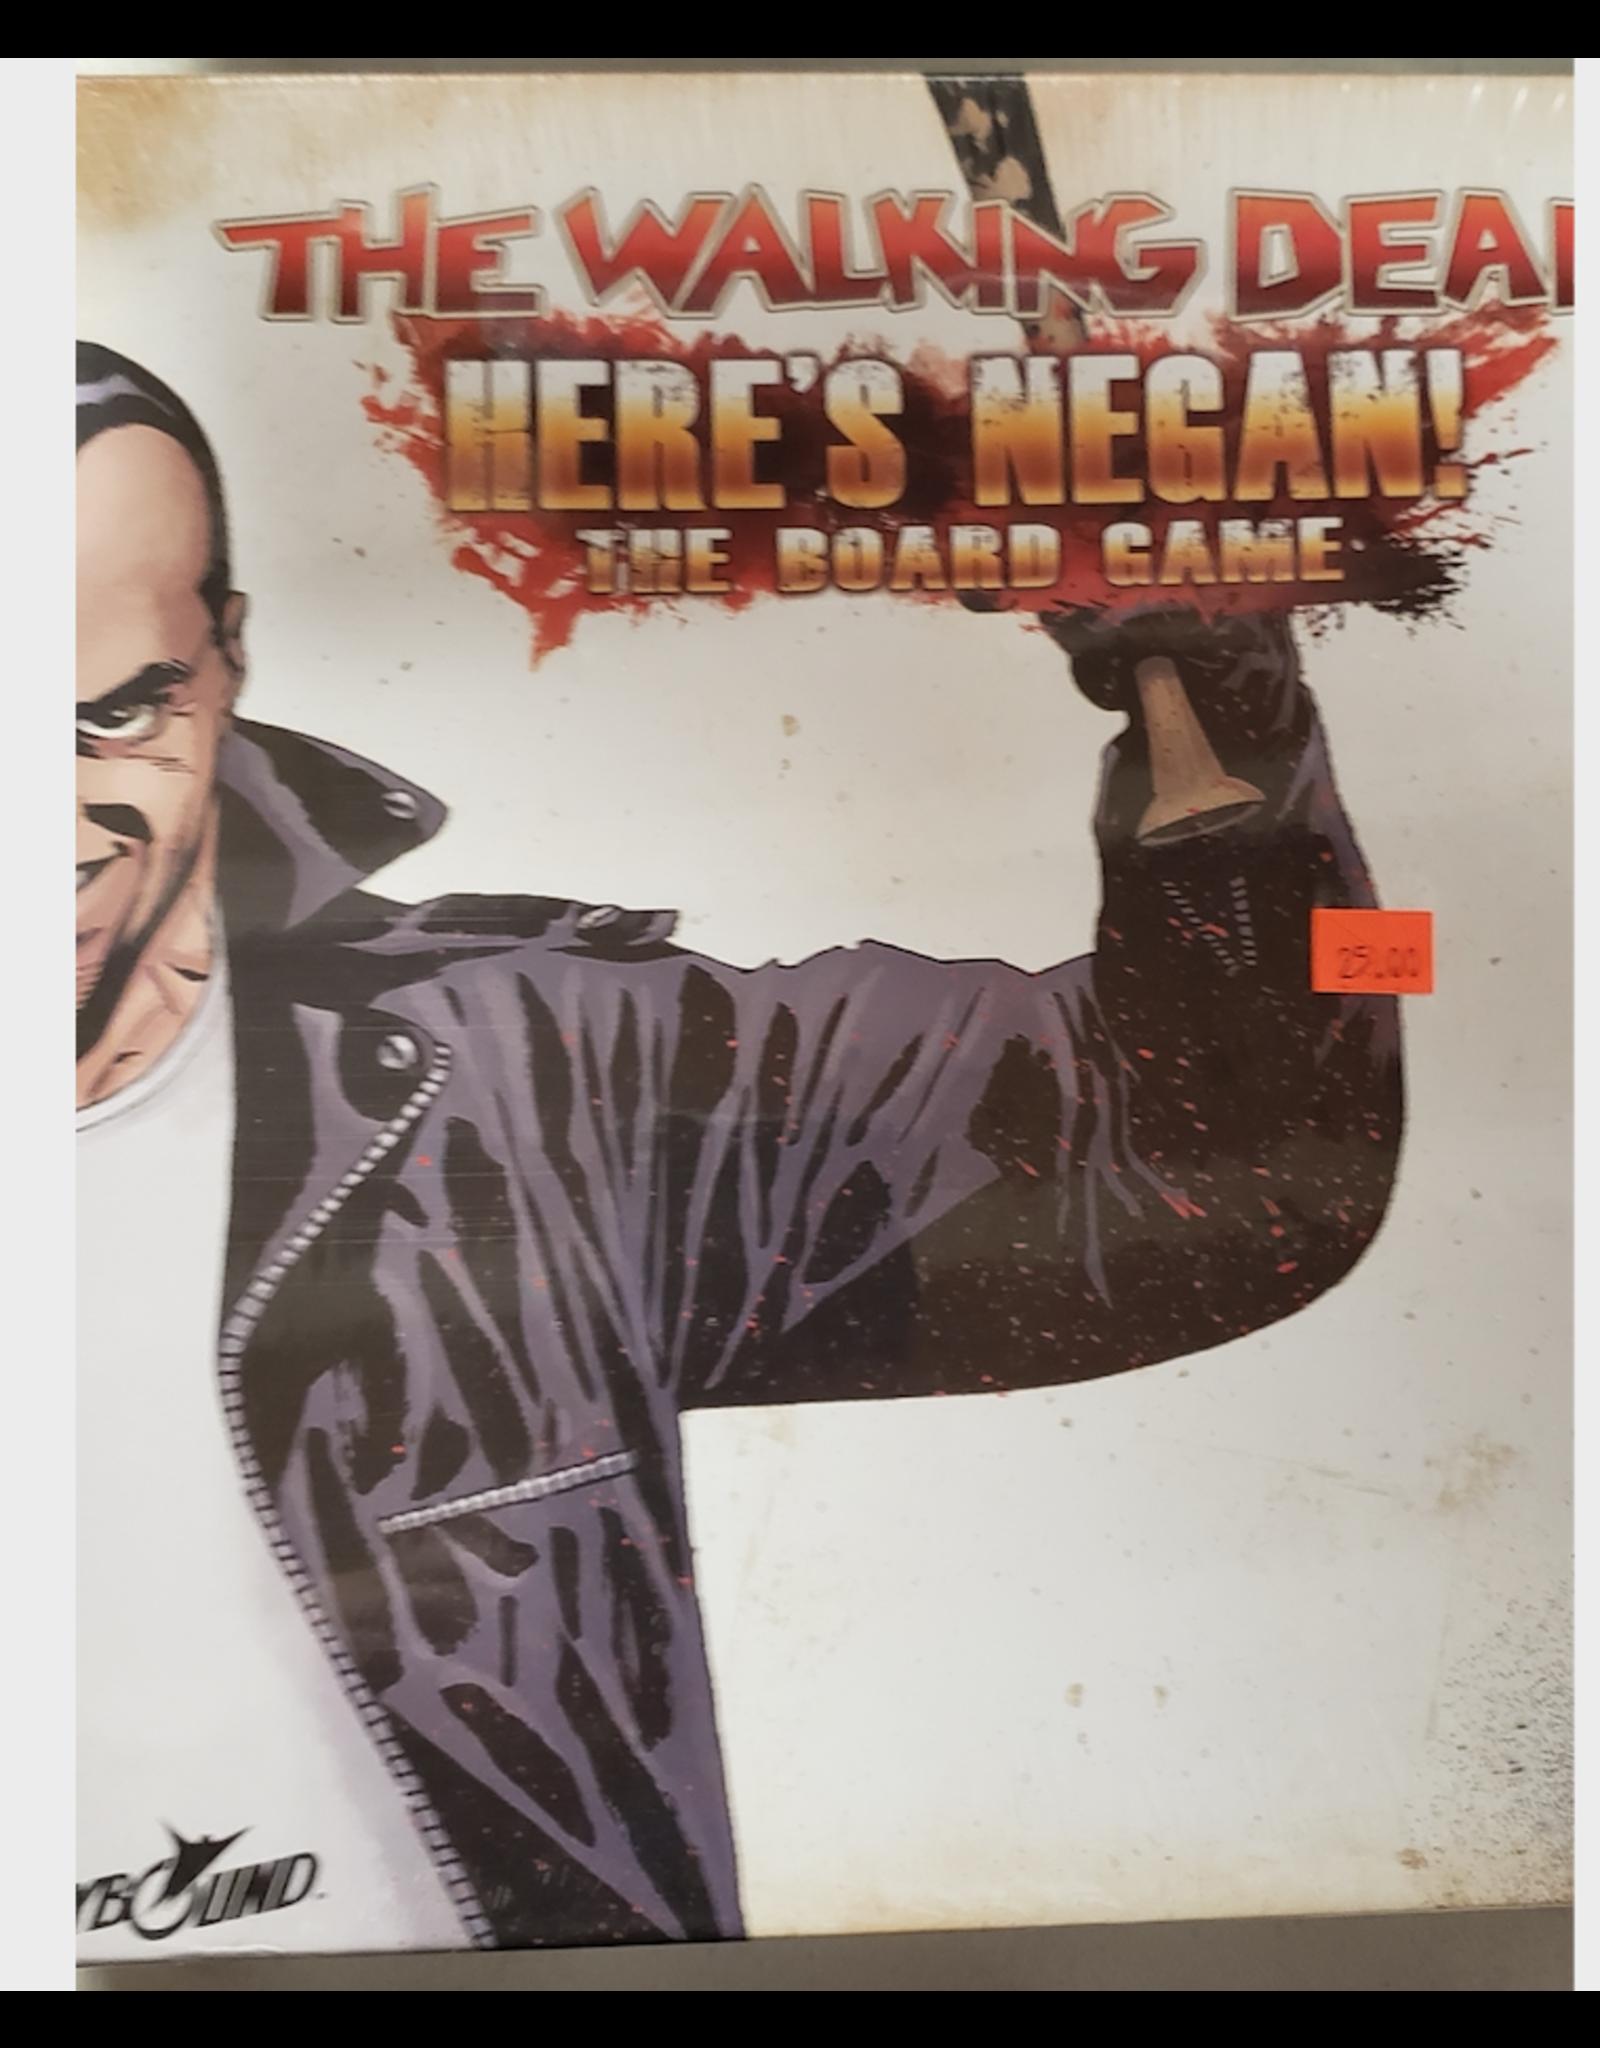 Ding & Dent The Walking Dead: Here's Negan! (Ding & Dent)